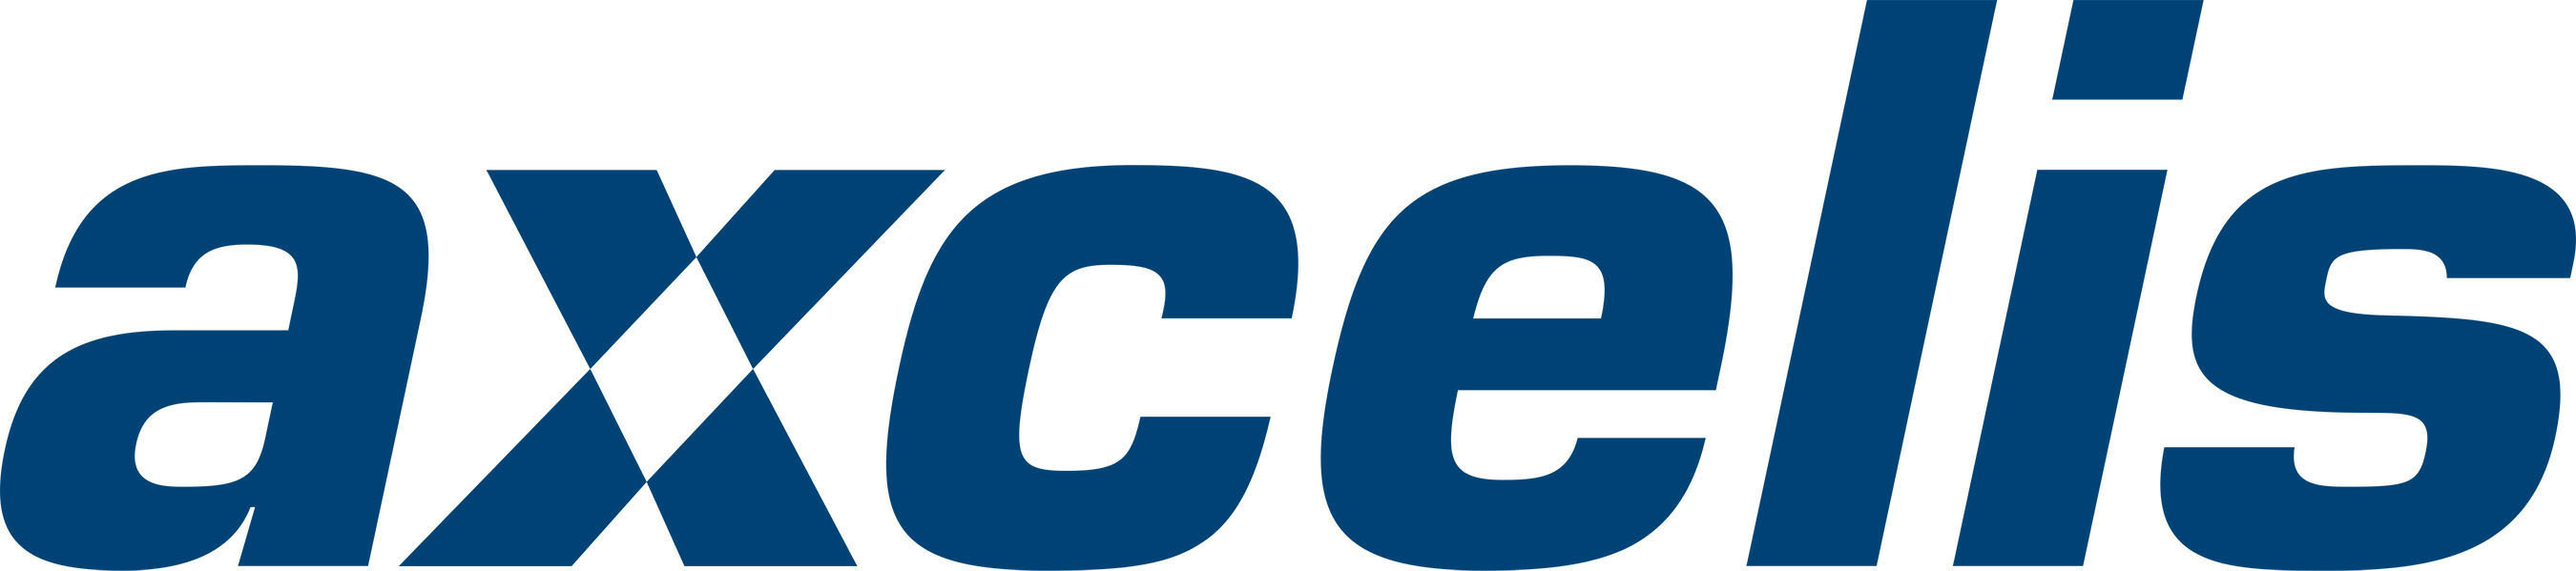 Axcelis Technologies, Inc. (PRNewsFoto/Axcelis Technologies, Inc.)